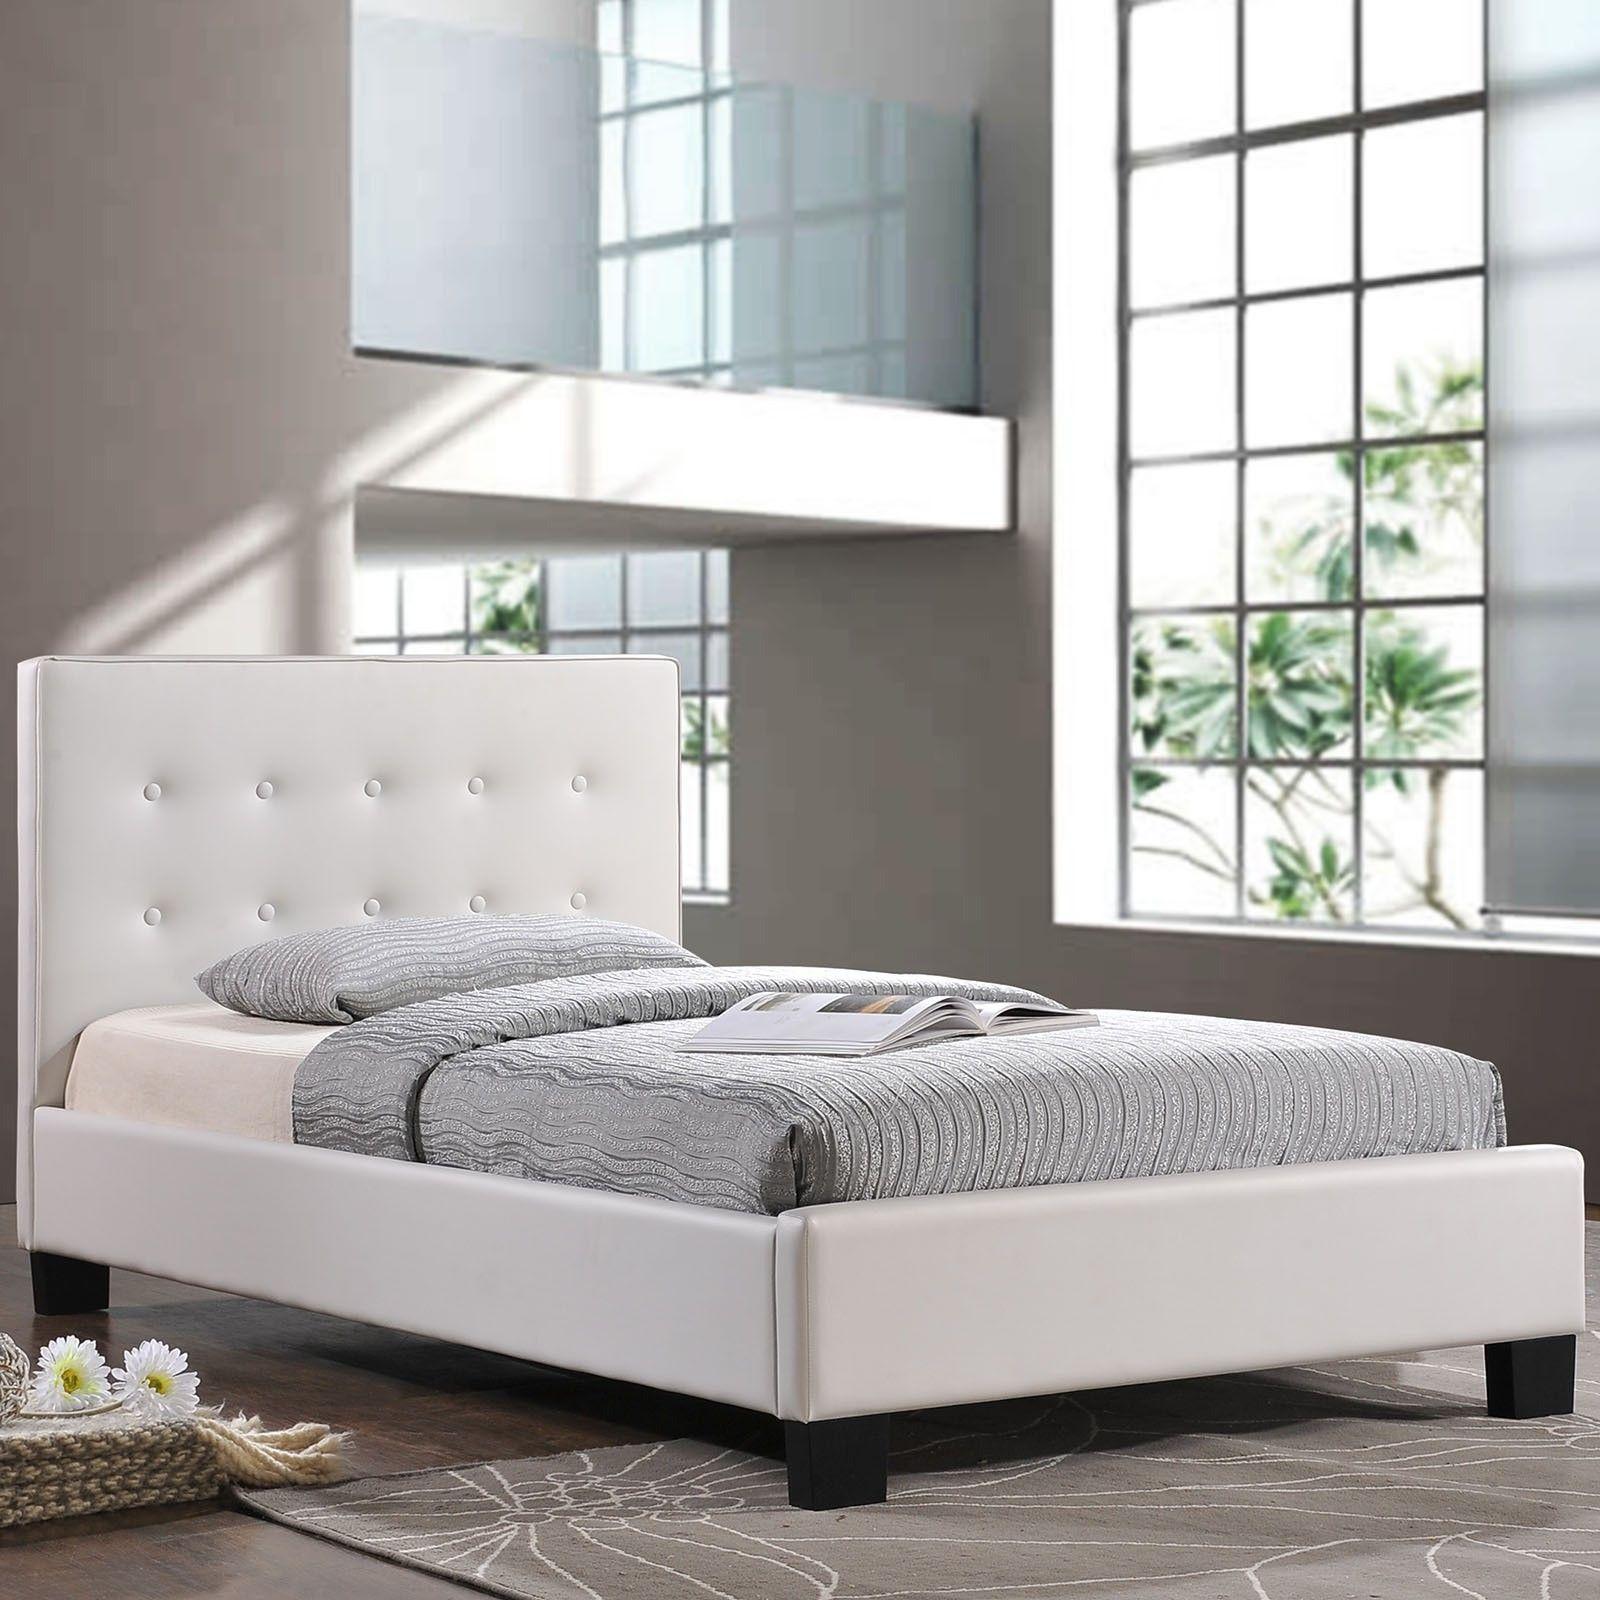 Extra Long Twin Bedroom Furniture Sets | Bedroom Sets | Pinterest